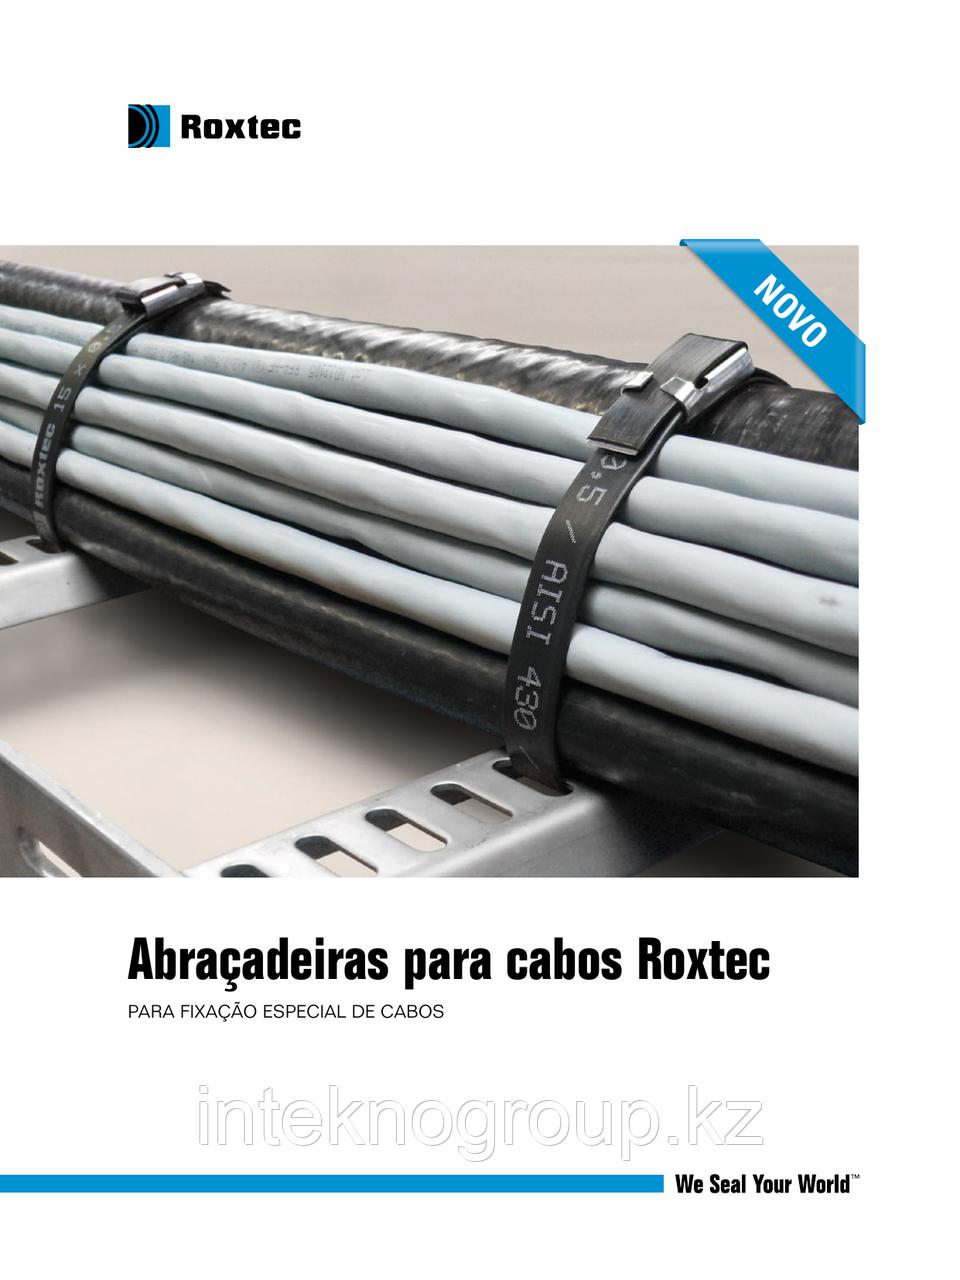 Roxtec Cable straps Strap 08x0,3 black/ss. L=300 mm